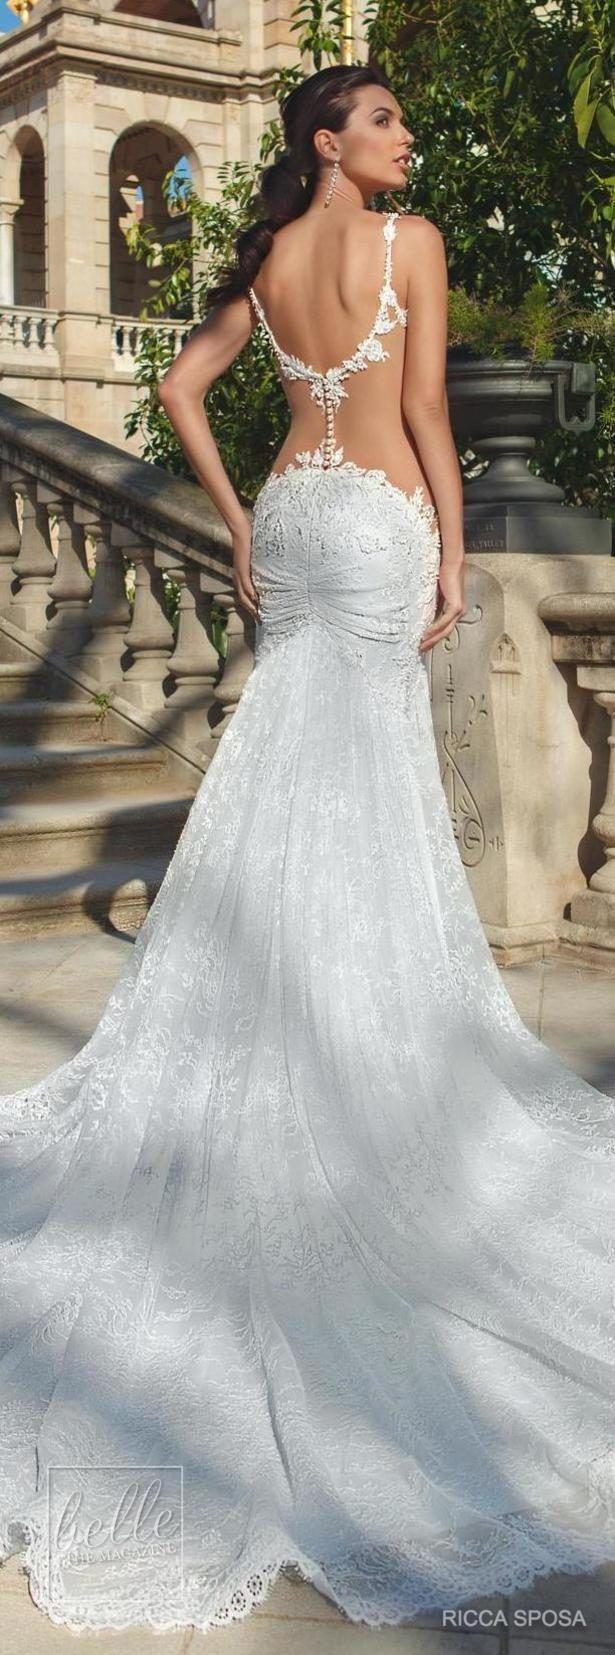 Harry potter wedding dress  Ricca Sposa Wedding Dress Collection  ucHola Barcelona